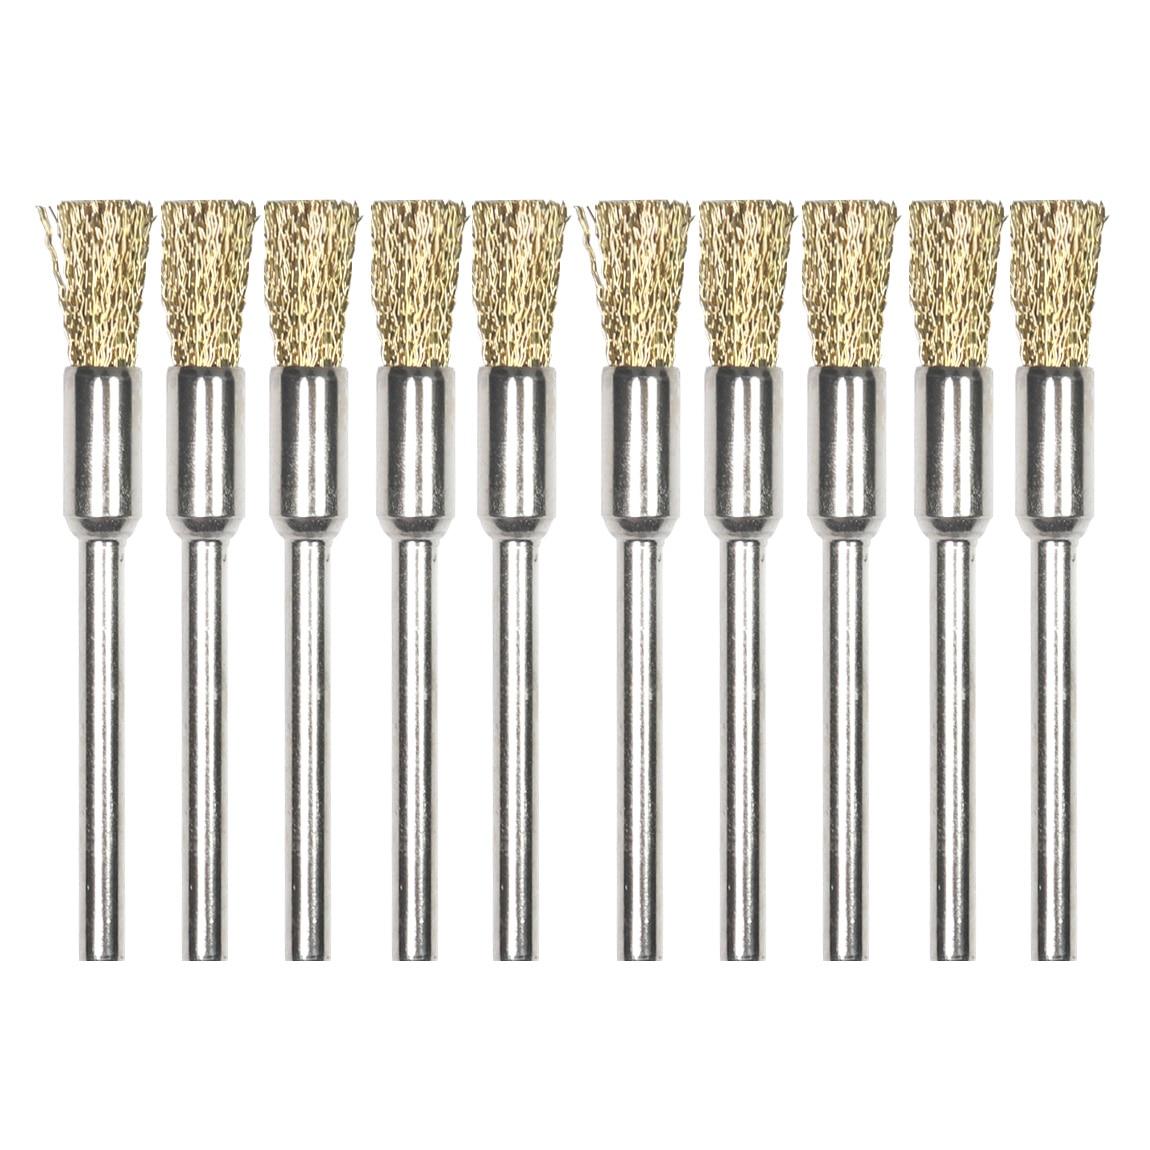 5pc Brass Wire Wheel Brush Abrasive Cleaning Rubbing Grinding Dremel Drill Bit